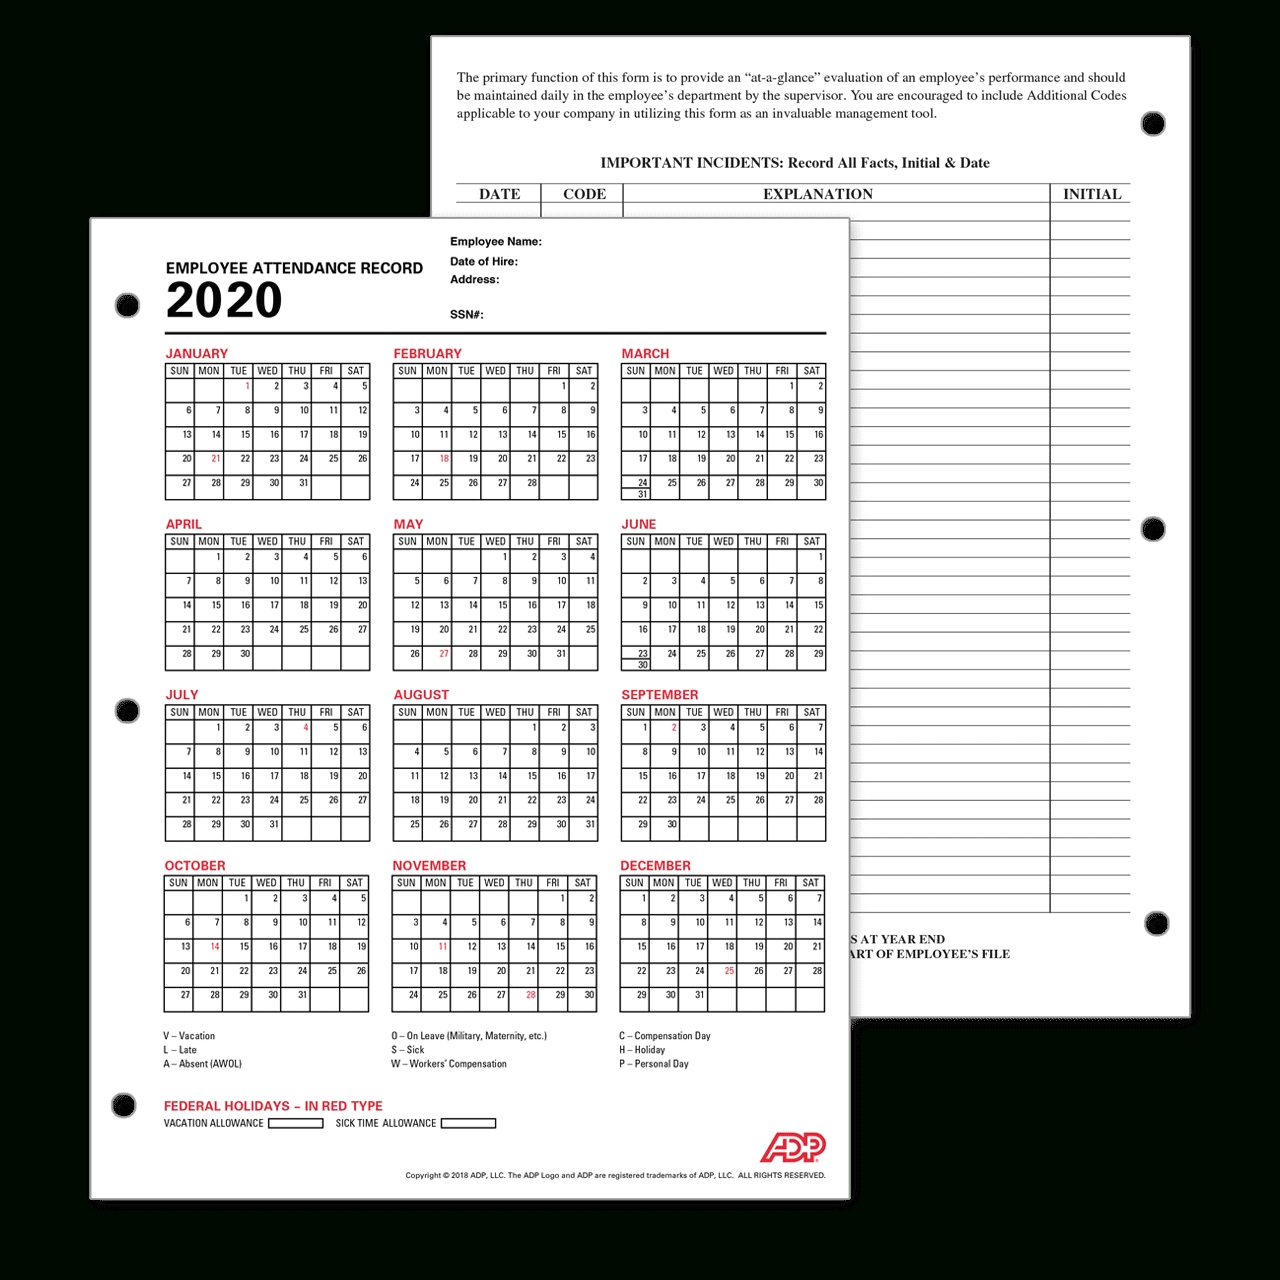 Adp Employee Attendance Record / Calendar-2021 Printable Attendance Tracker